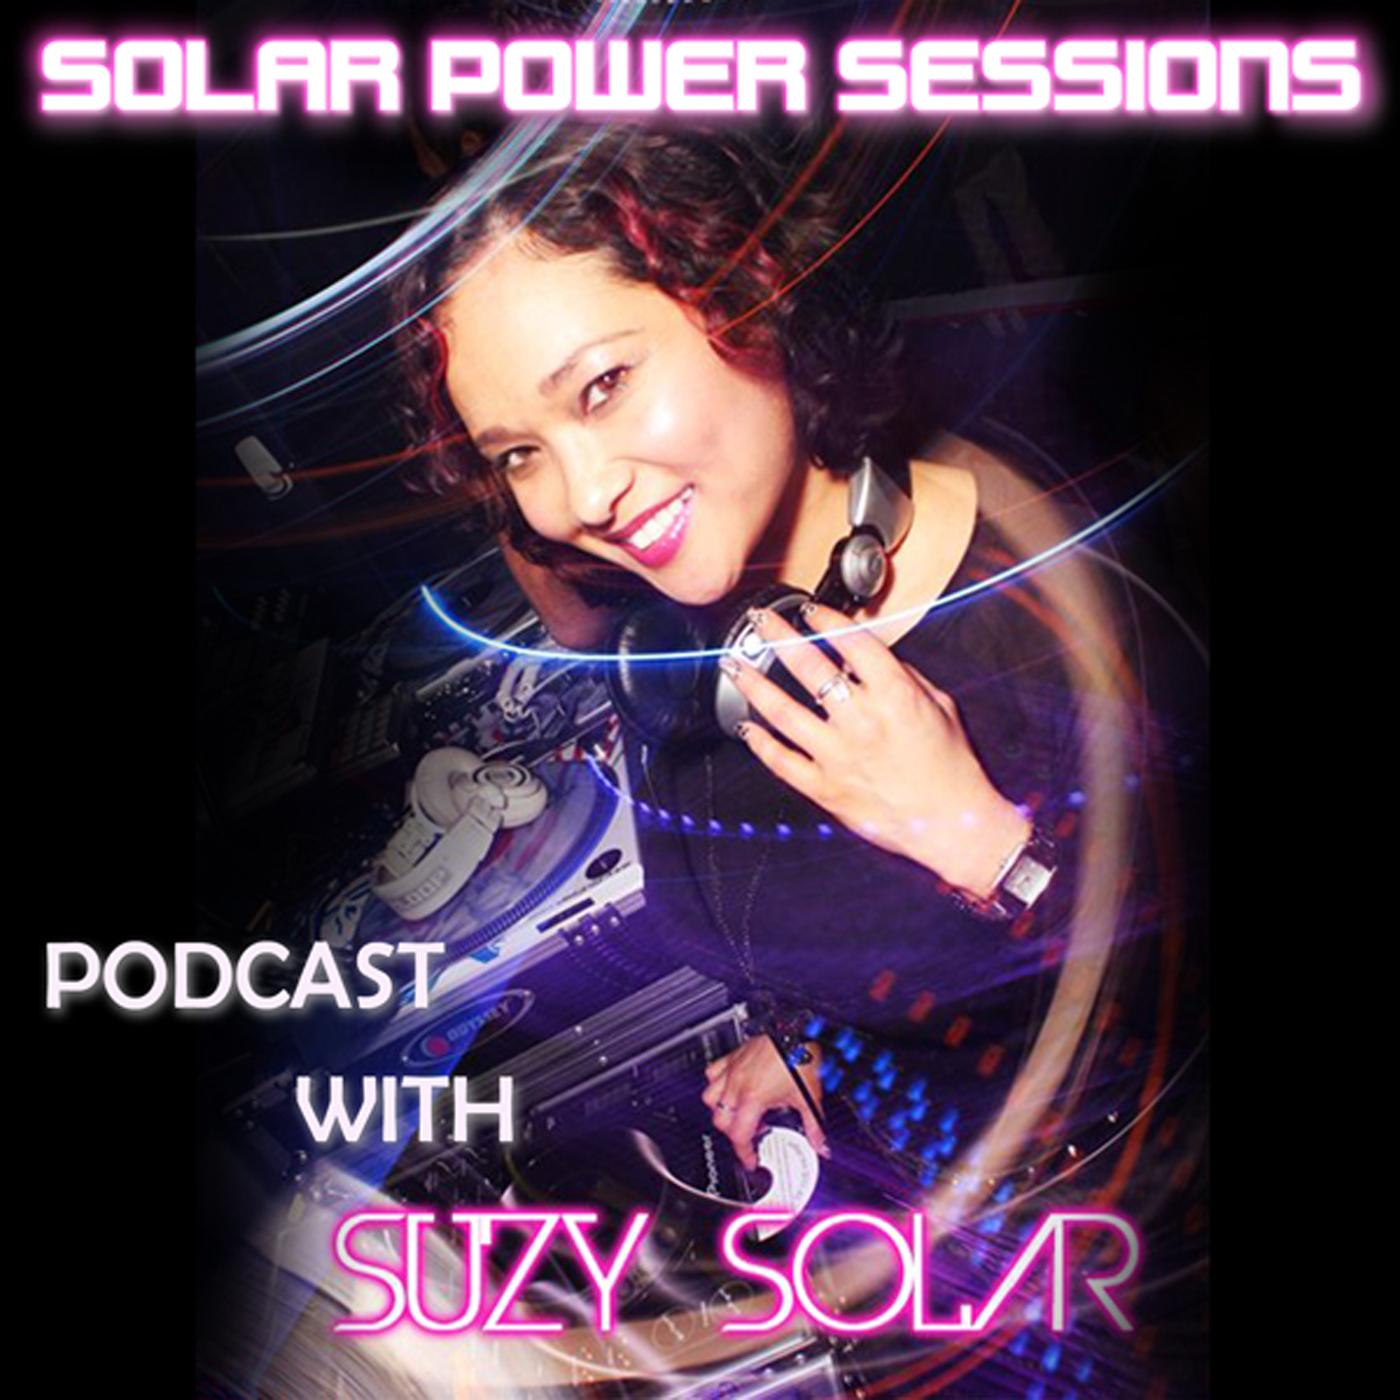 Solar Power Sessions - Suzy Solar